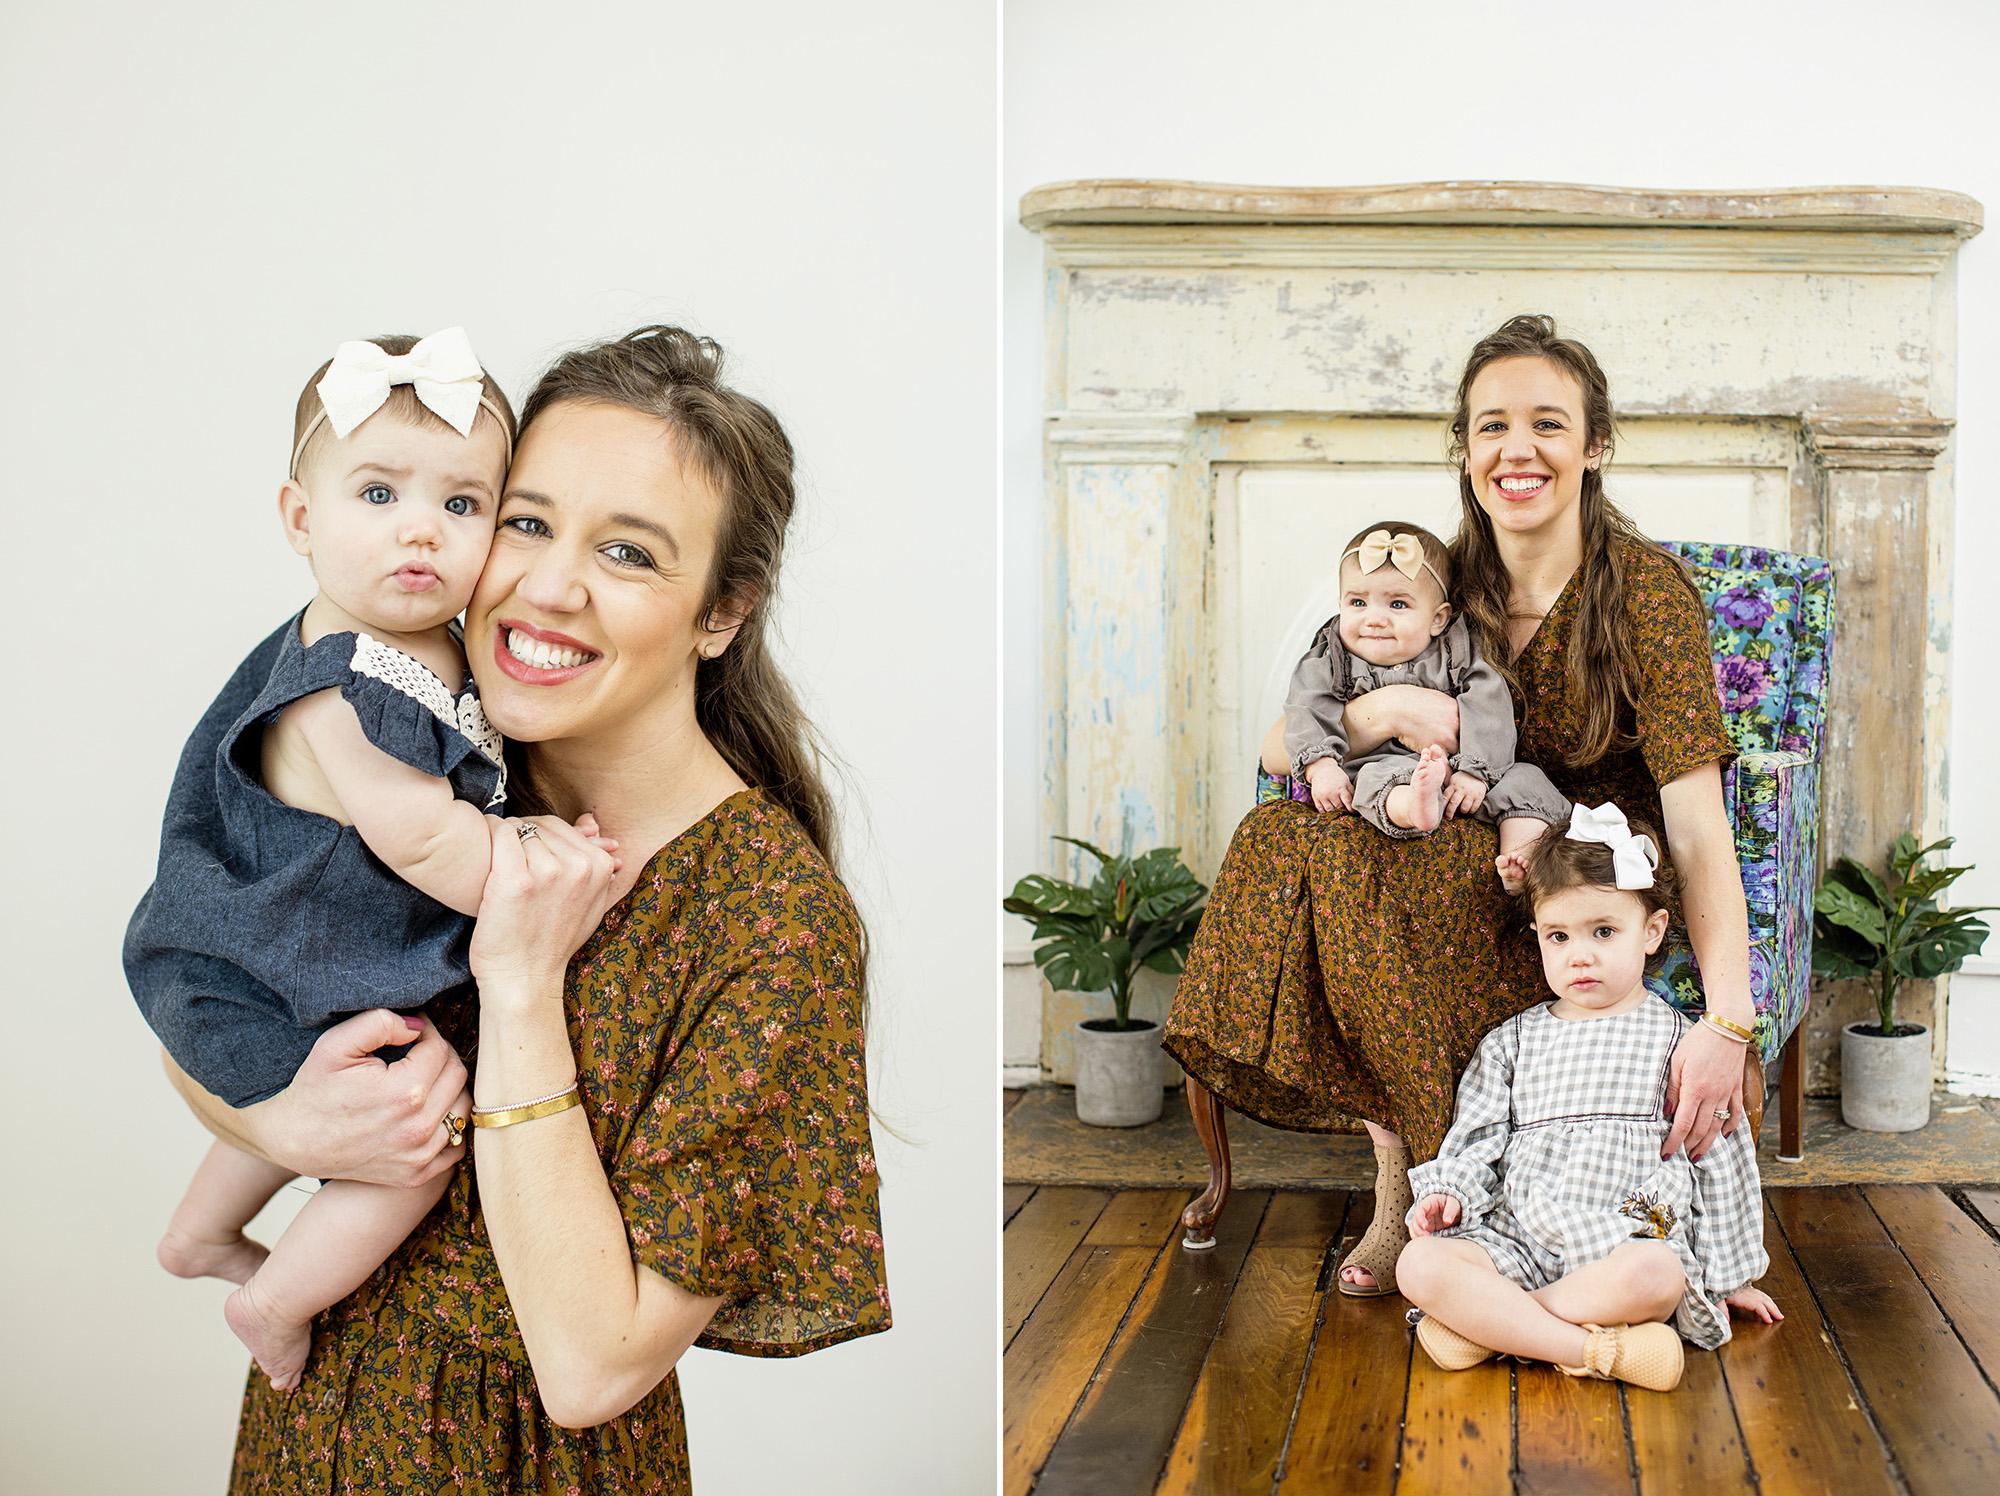 Seriously_Sabrina_Photography_Lexington_Kentucky_Studio_Lex_Portraits_Family_Oyler20.jpg